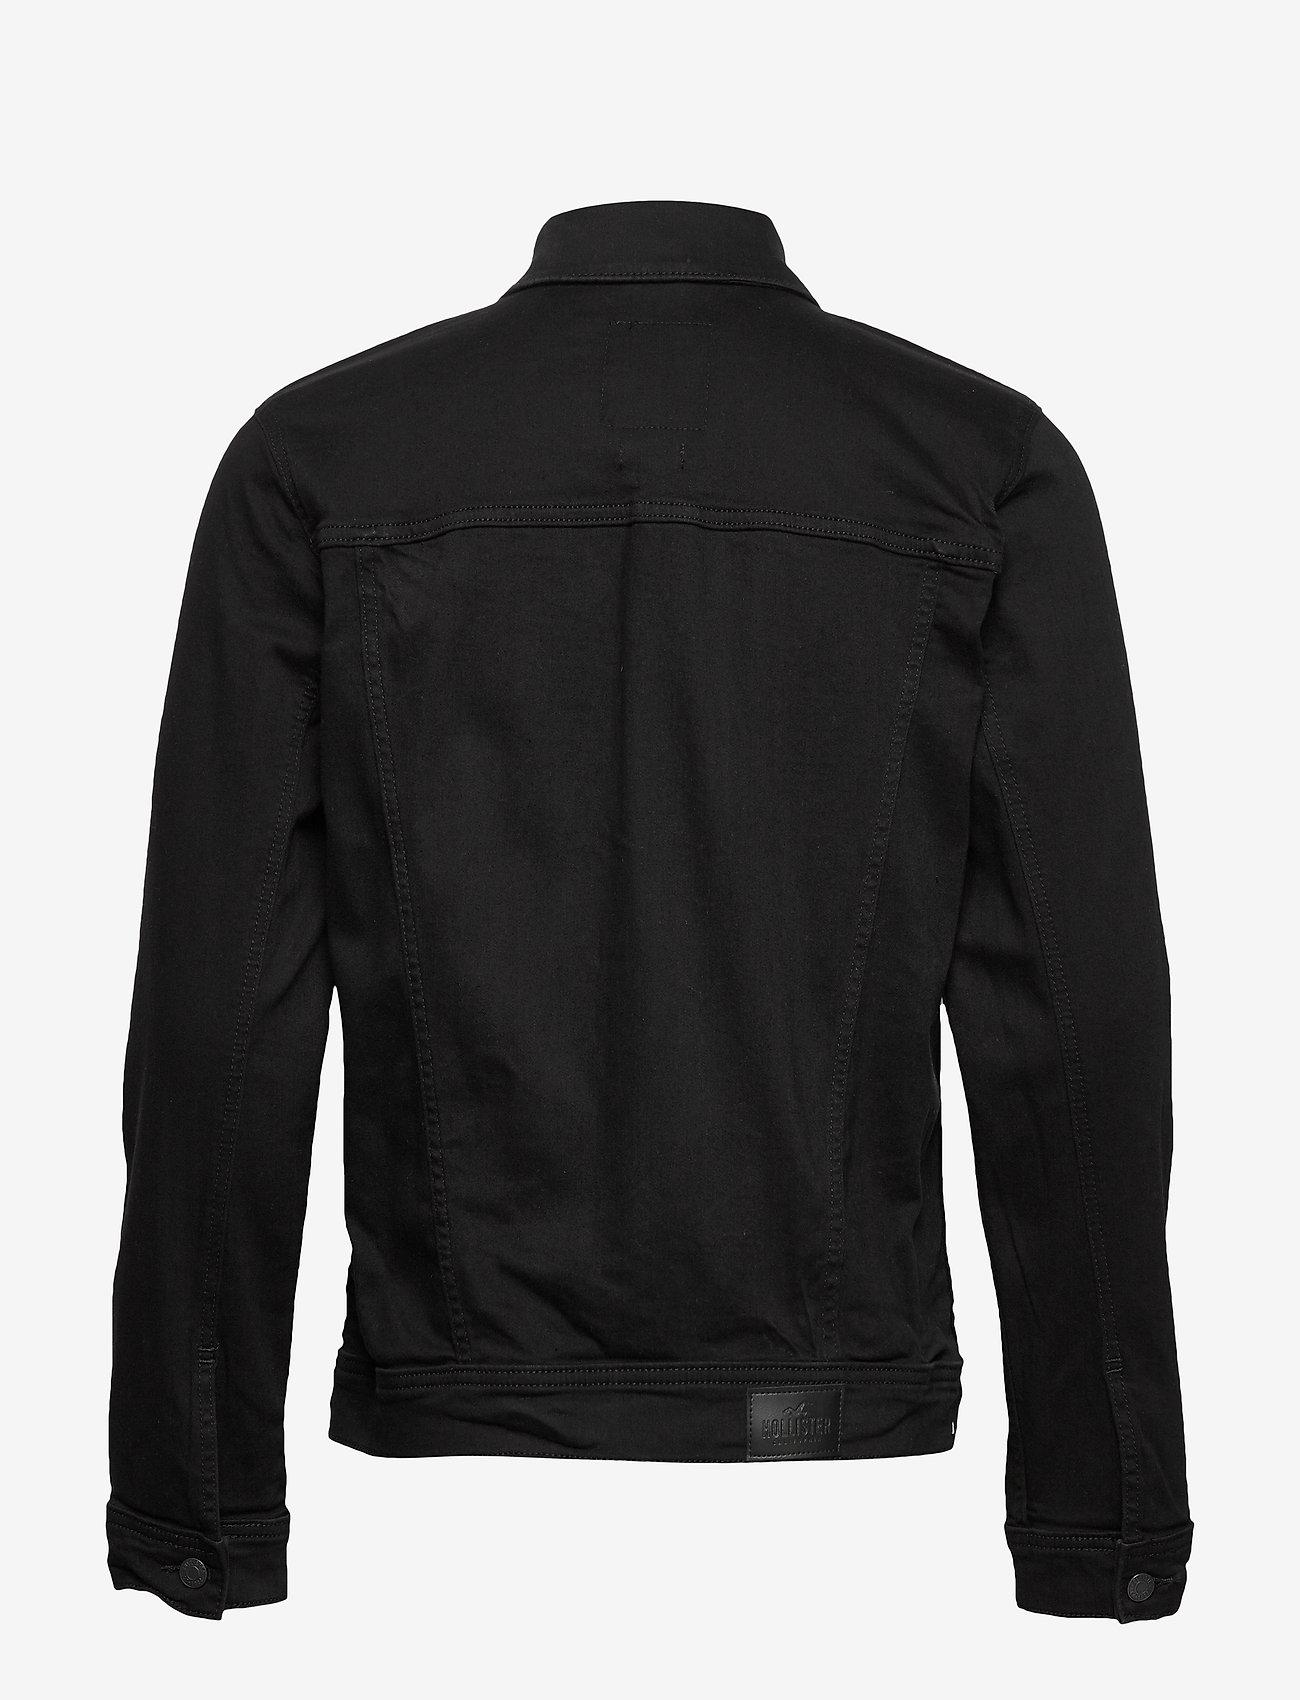 Hollister Wash Denim Trucker - Jackets & Coats